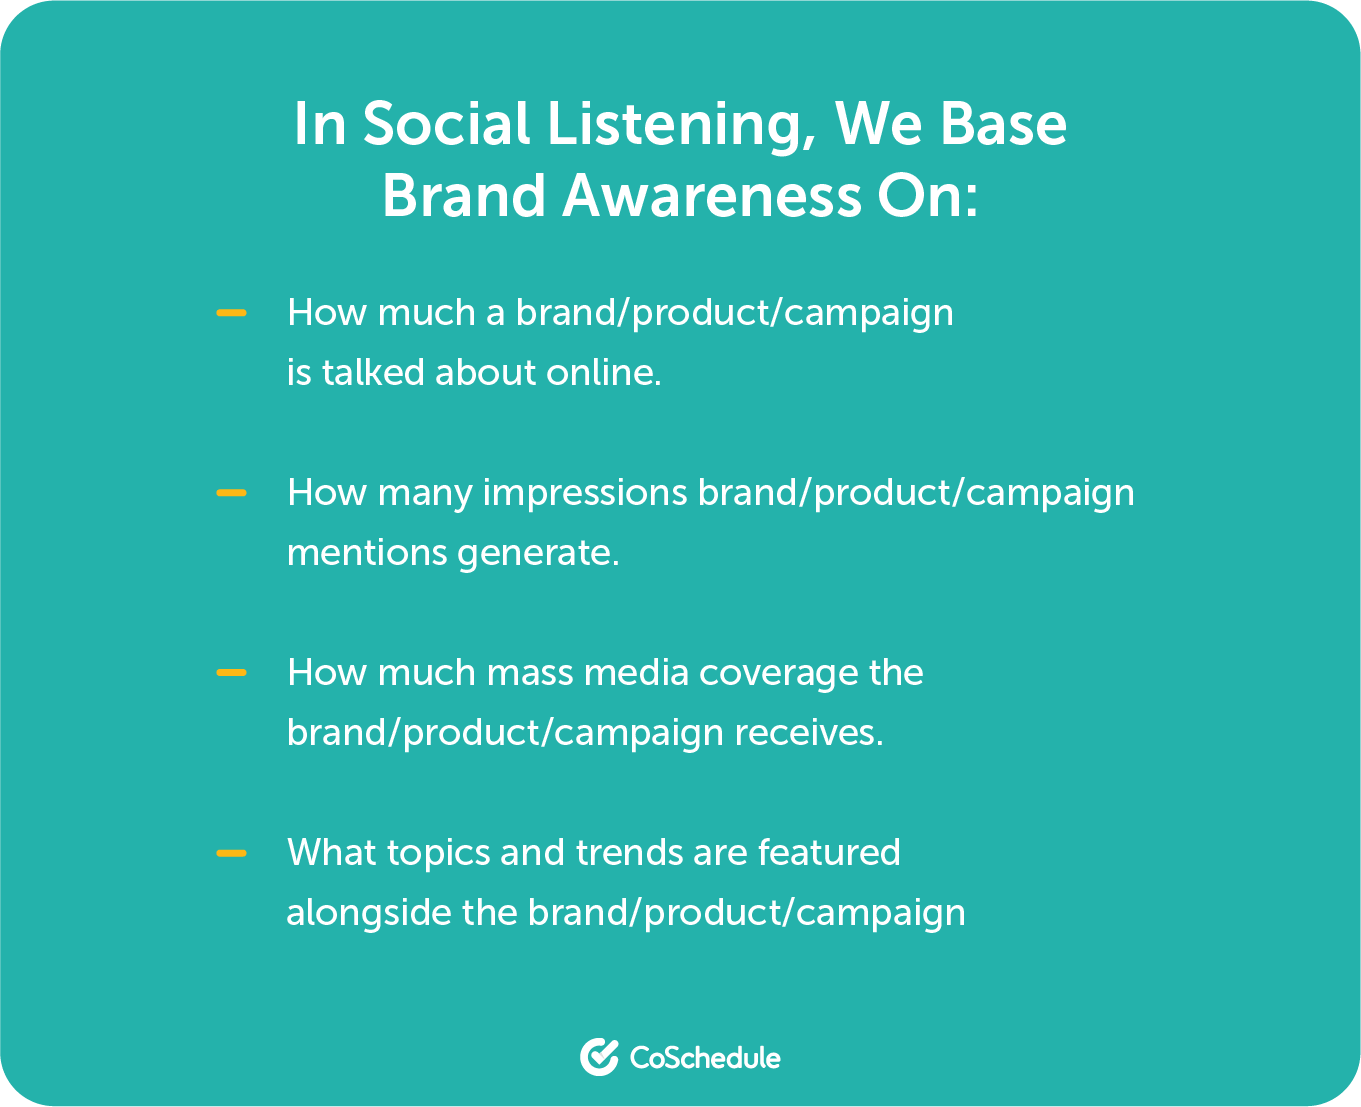 Social listening brand awareness